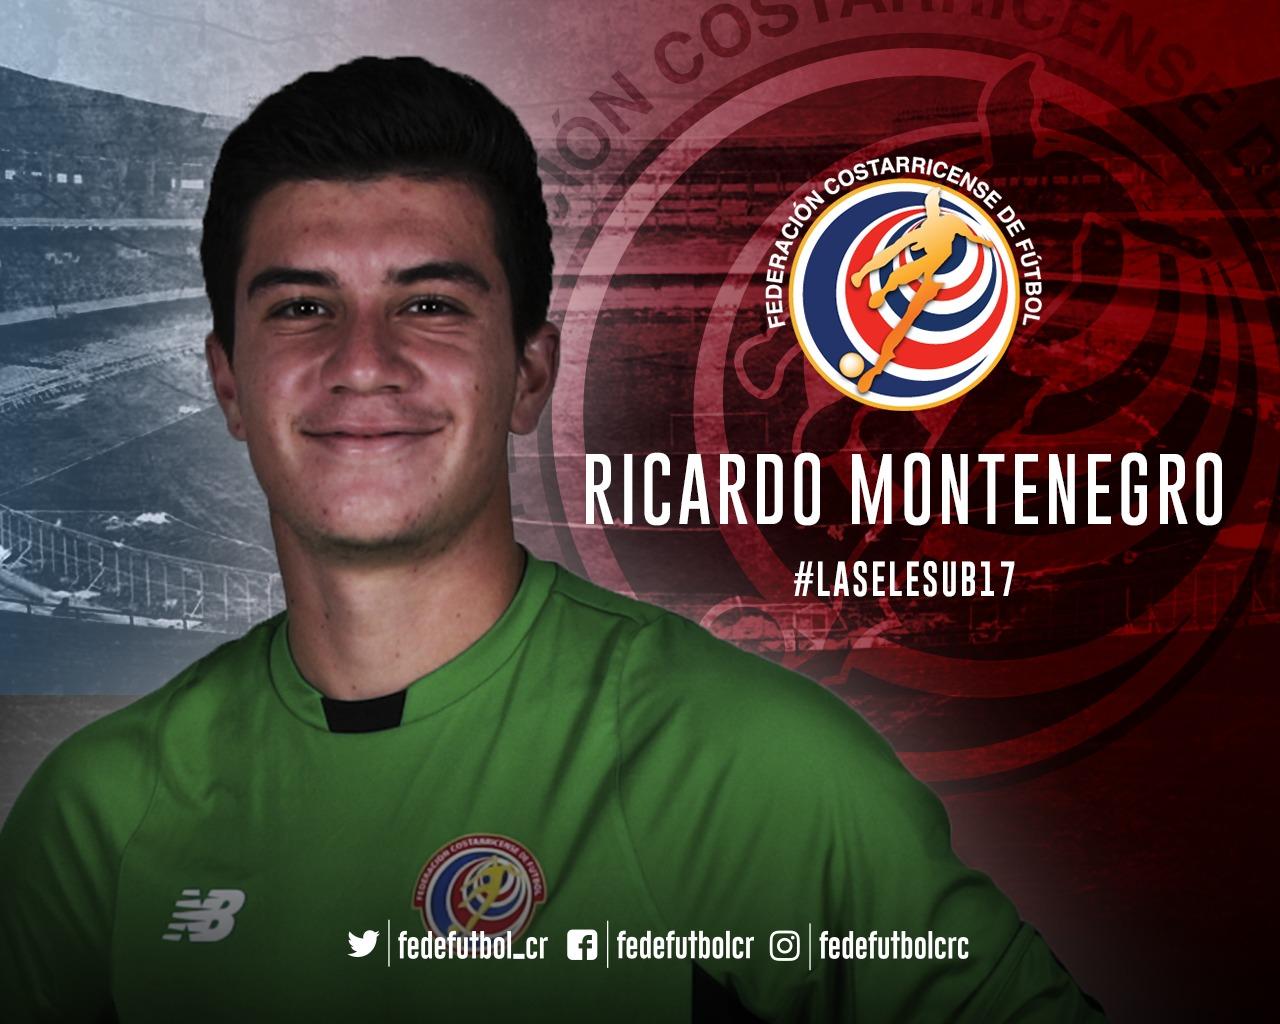 ¿Quién es Ricardo Montenegro?